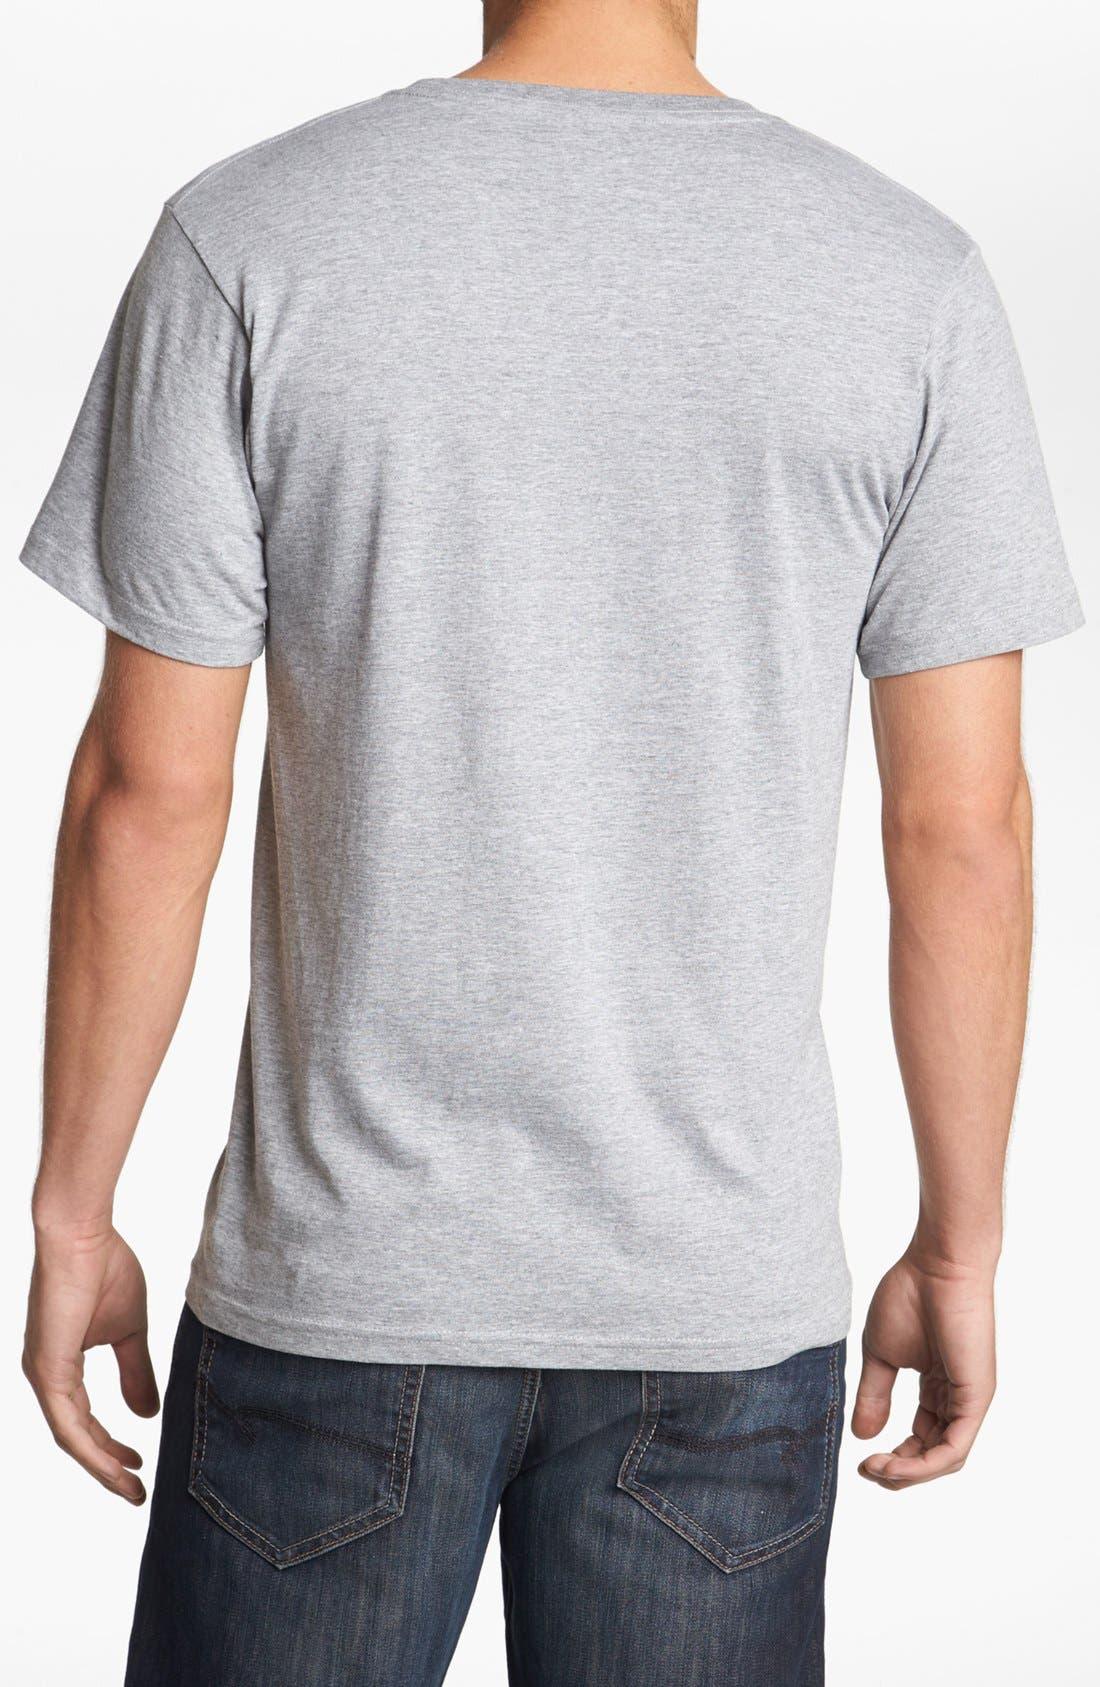 Alternate Image 2  - Horses Cut Shop 'Moby Dick's' T-Shirt